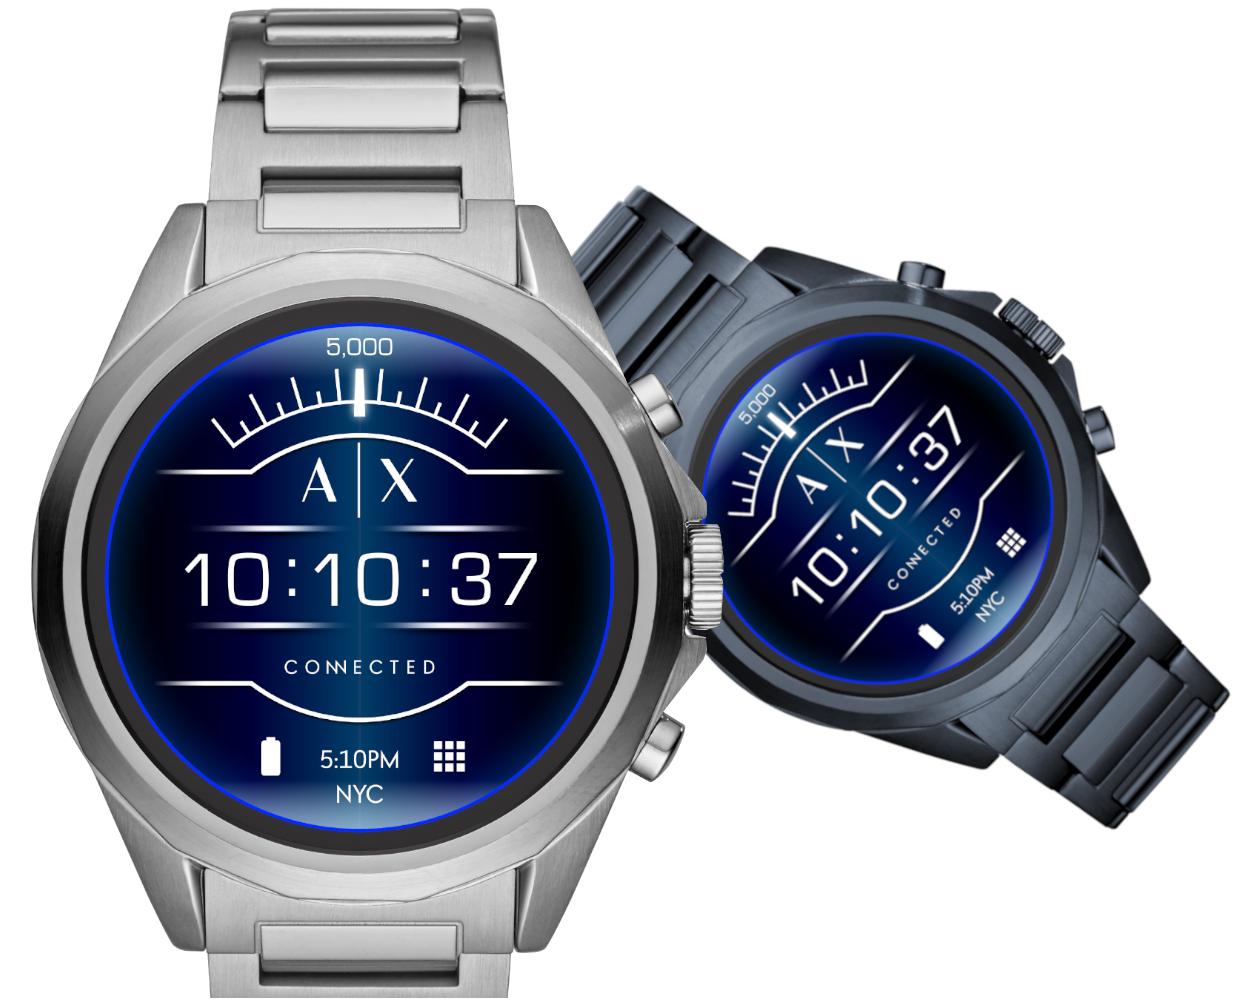 bac2ca4fd Armani Exchange Connected: Erste Touchscreen-Smartwatch des Labels ...